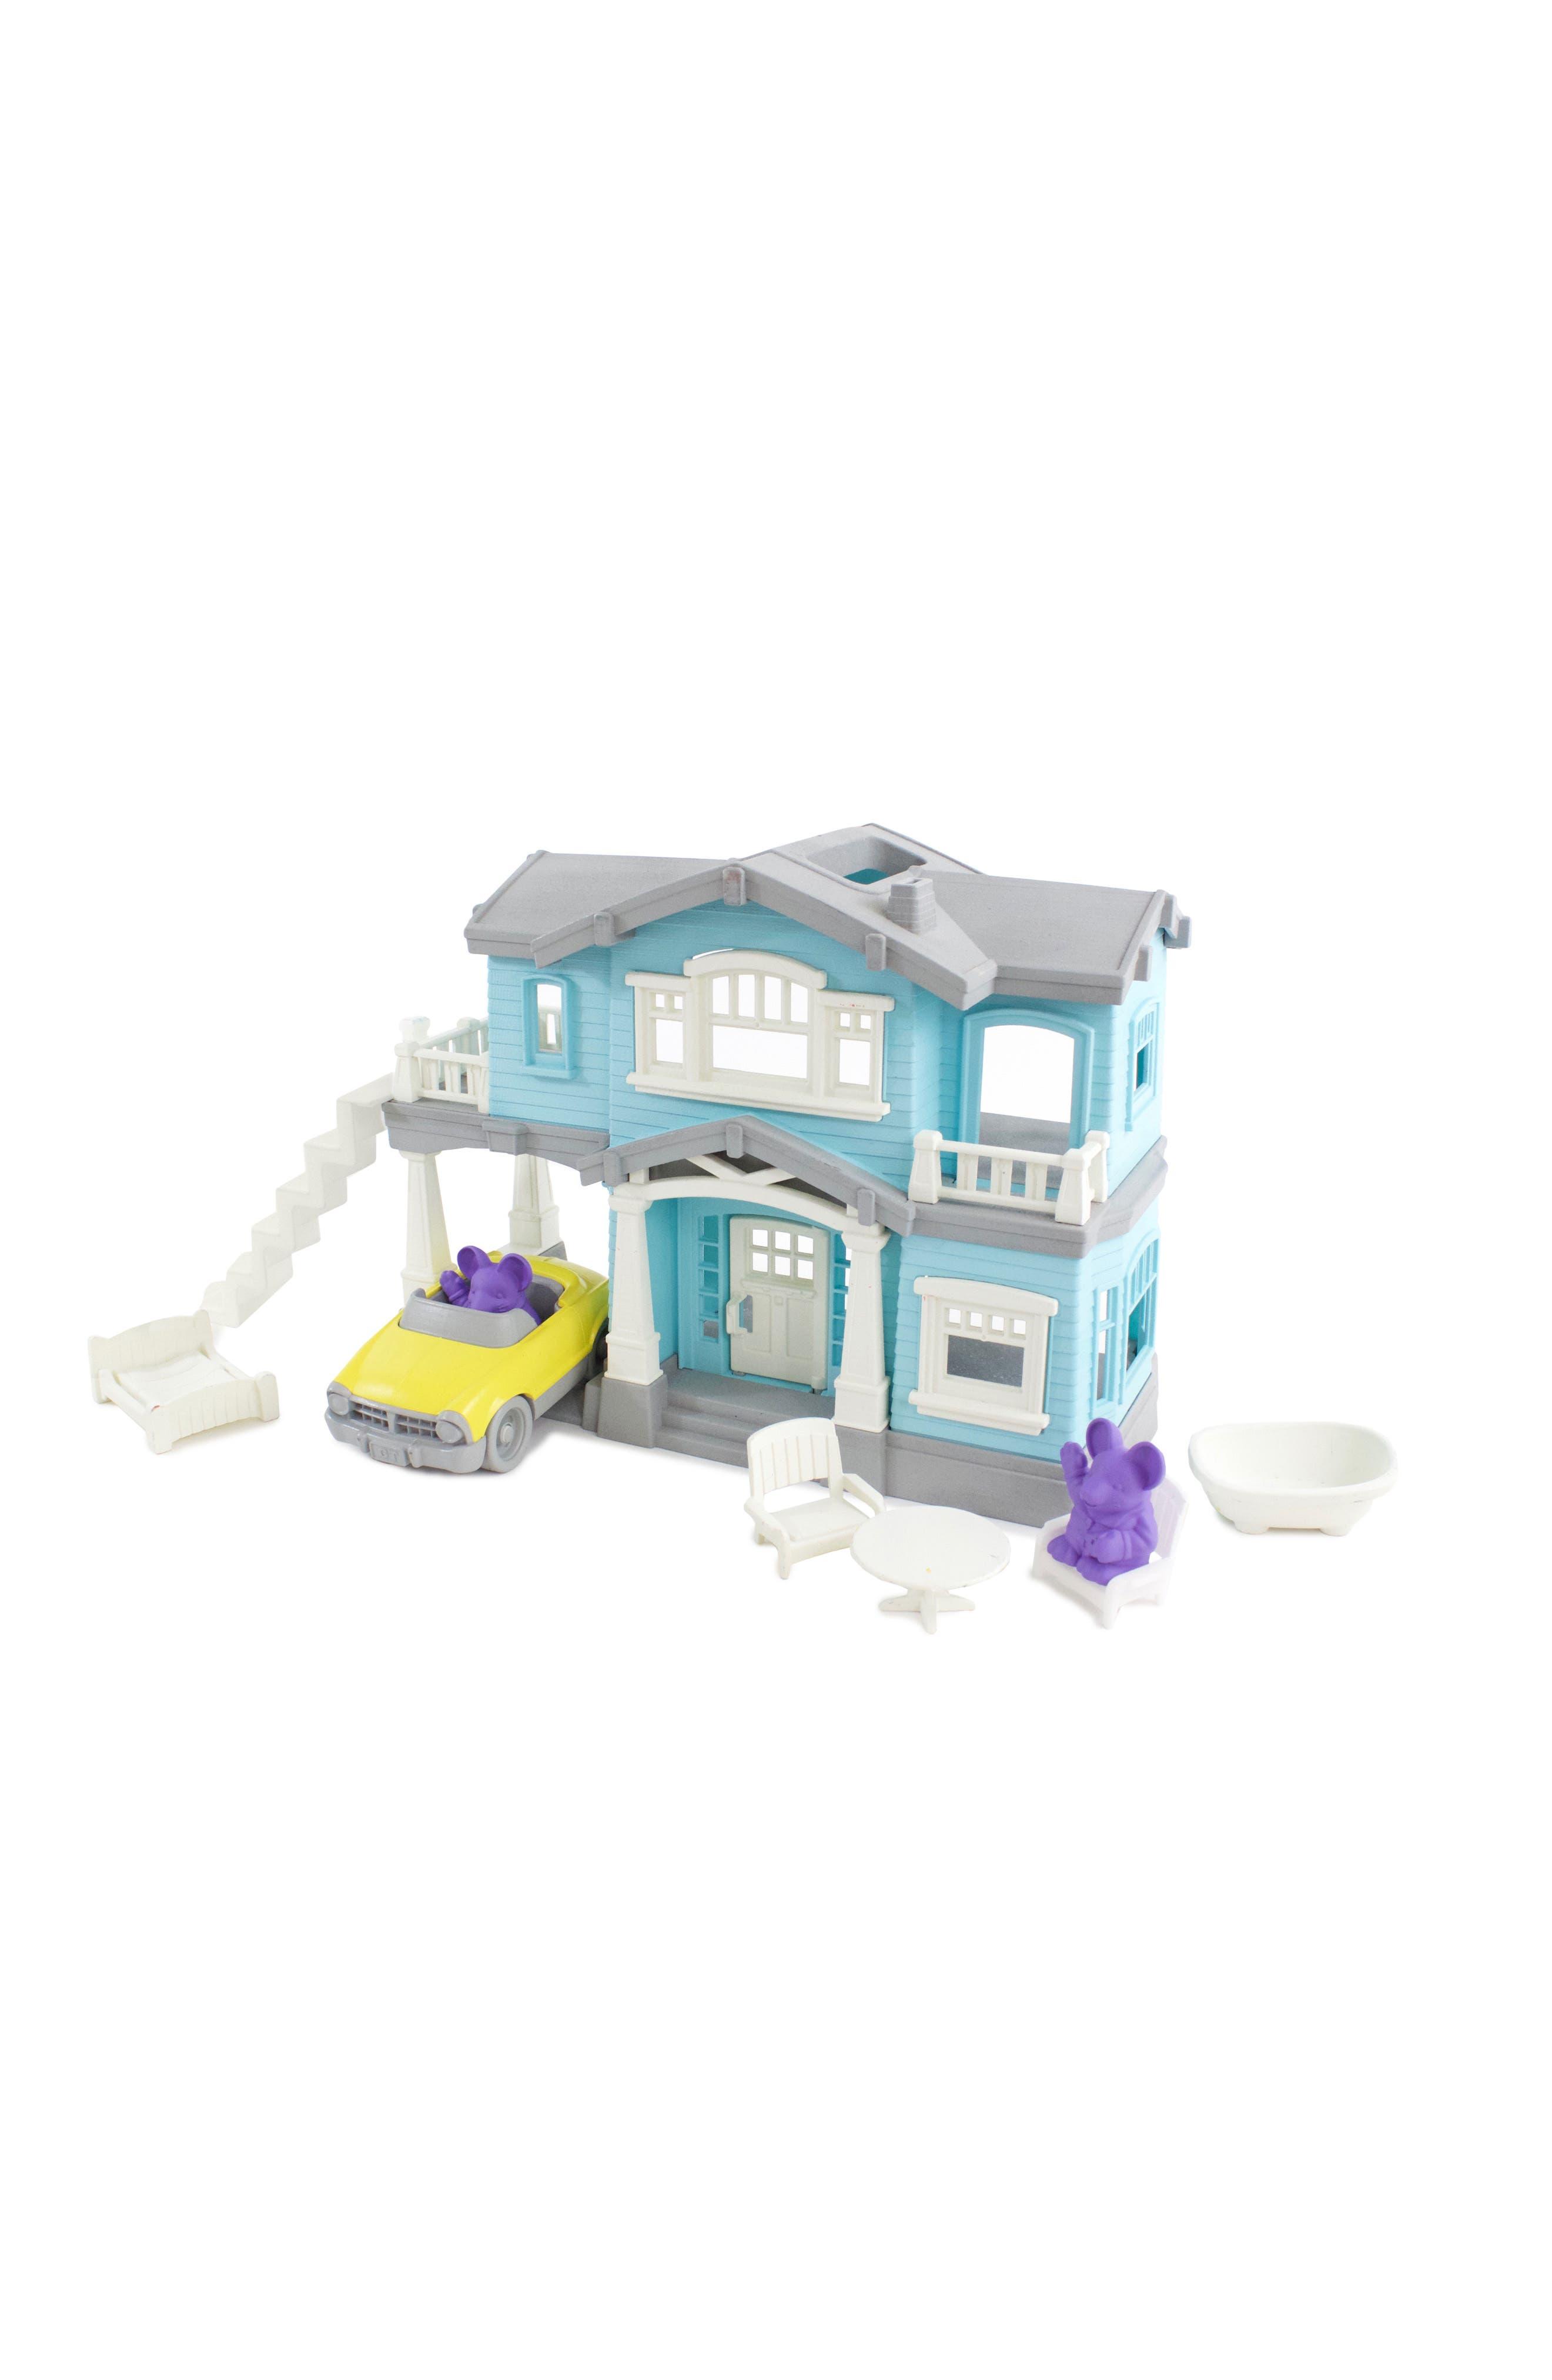 10-Piece House Play Set,                             Alternate thumbnail 2, color,                             450